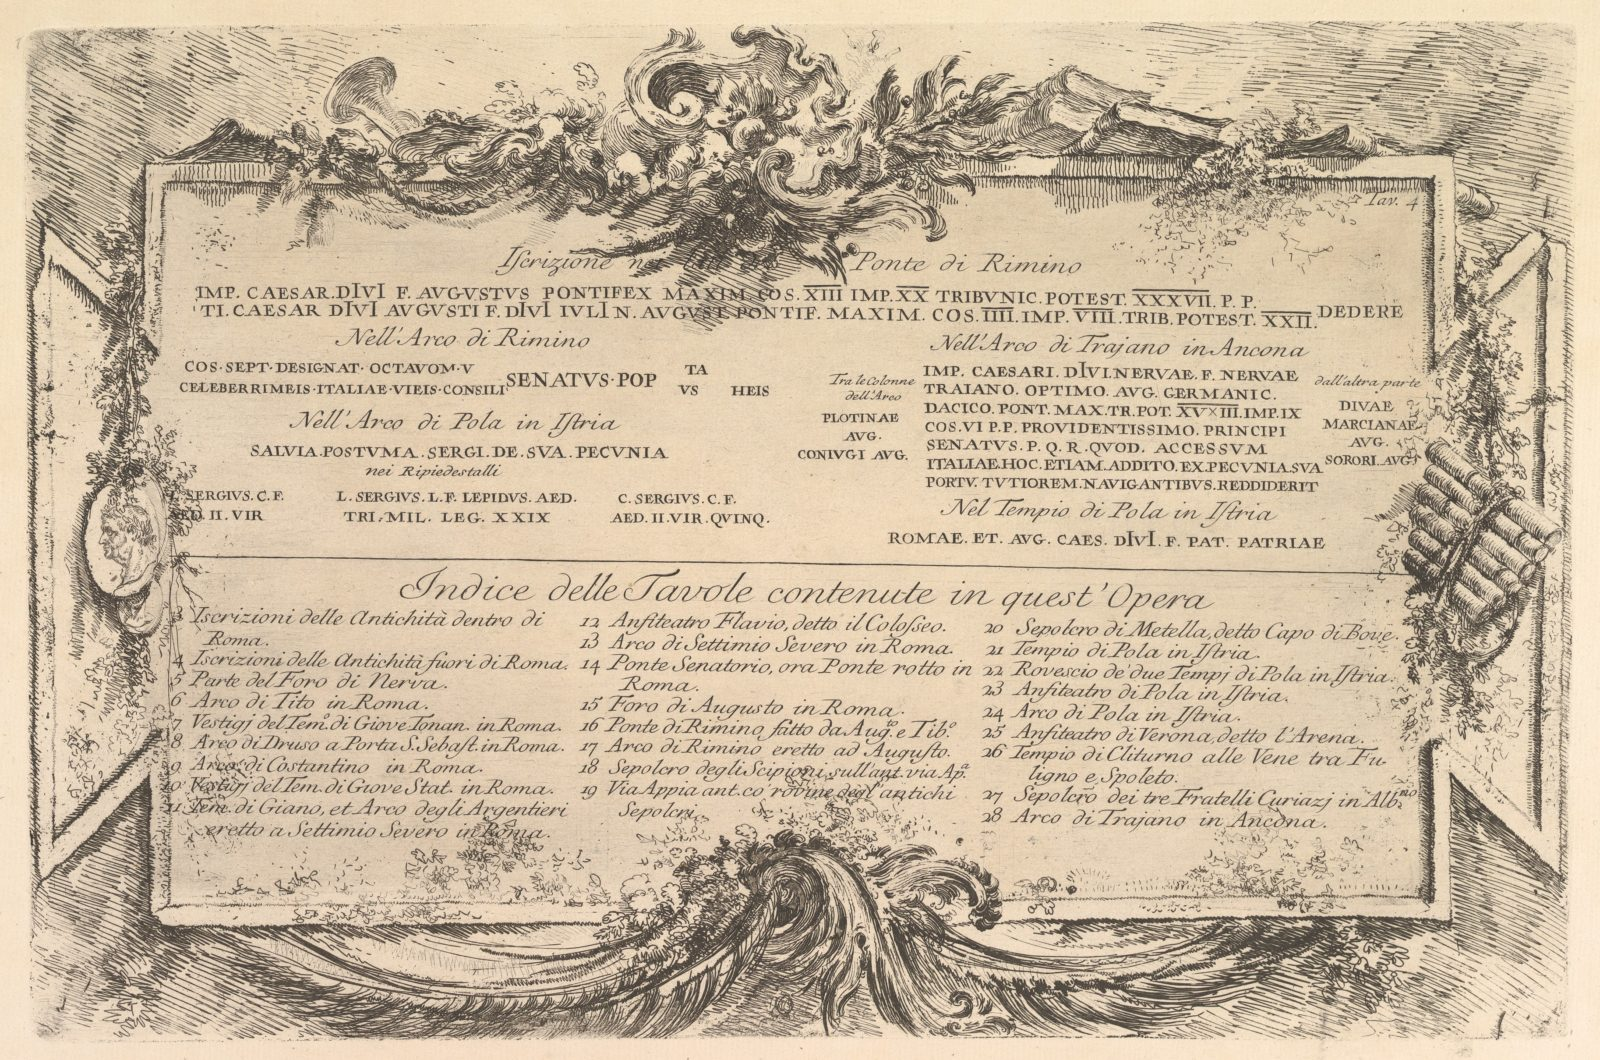 "Beginning ""Iscrizione nei lati del Ponte di Rimino"" (""Inscription on the side of the Rimini Bridge"") and followed by an index of plates in the volume."